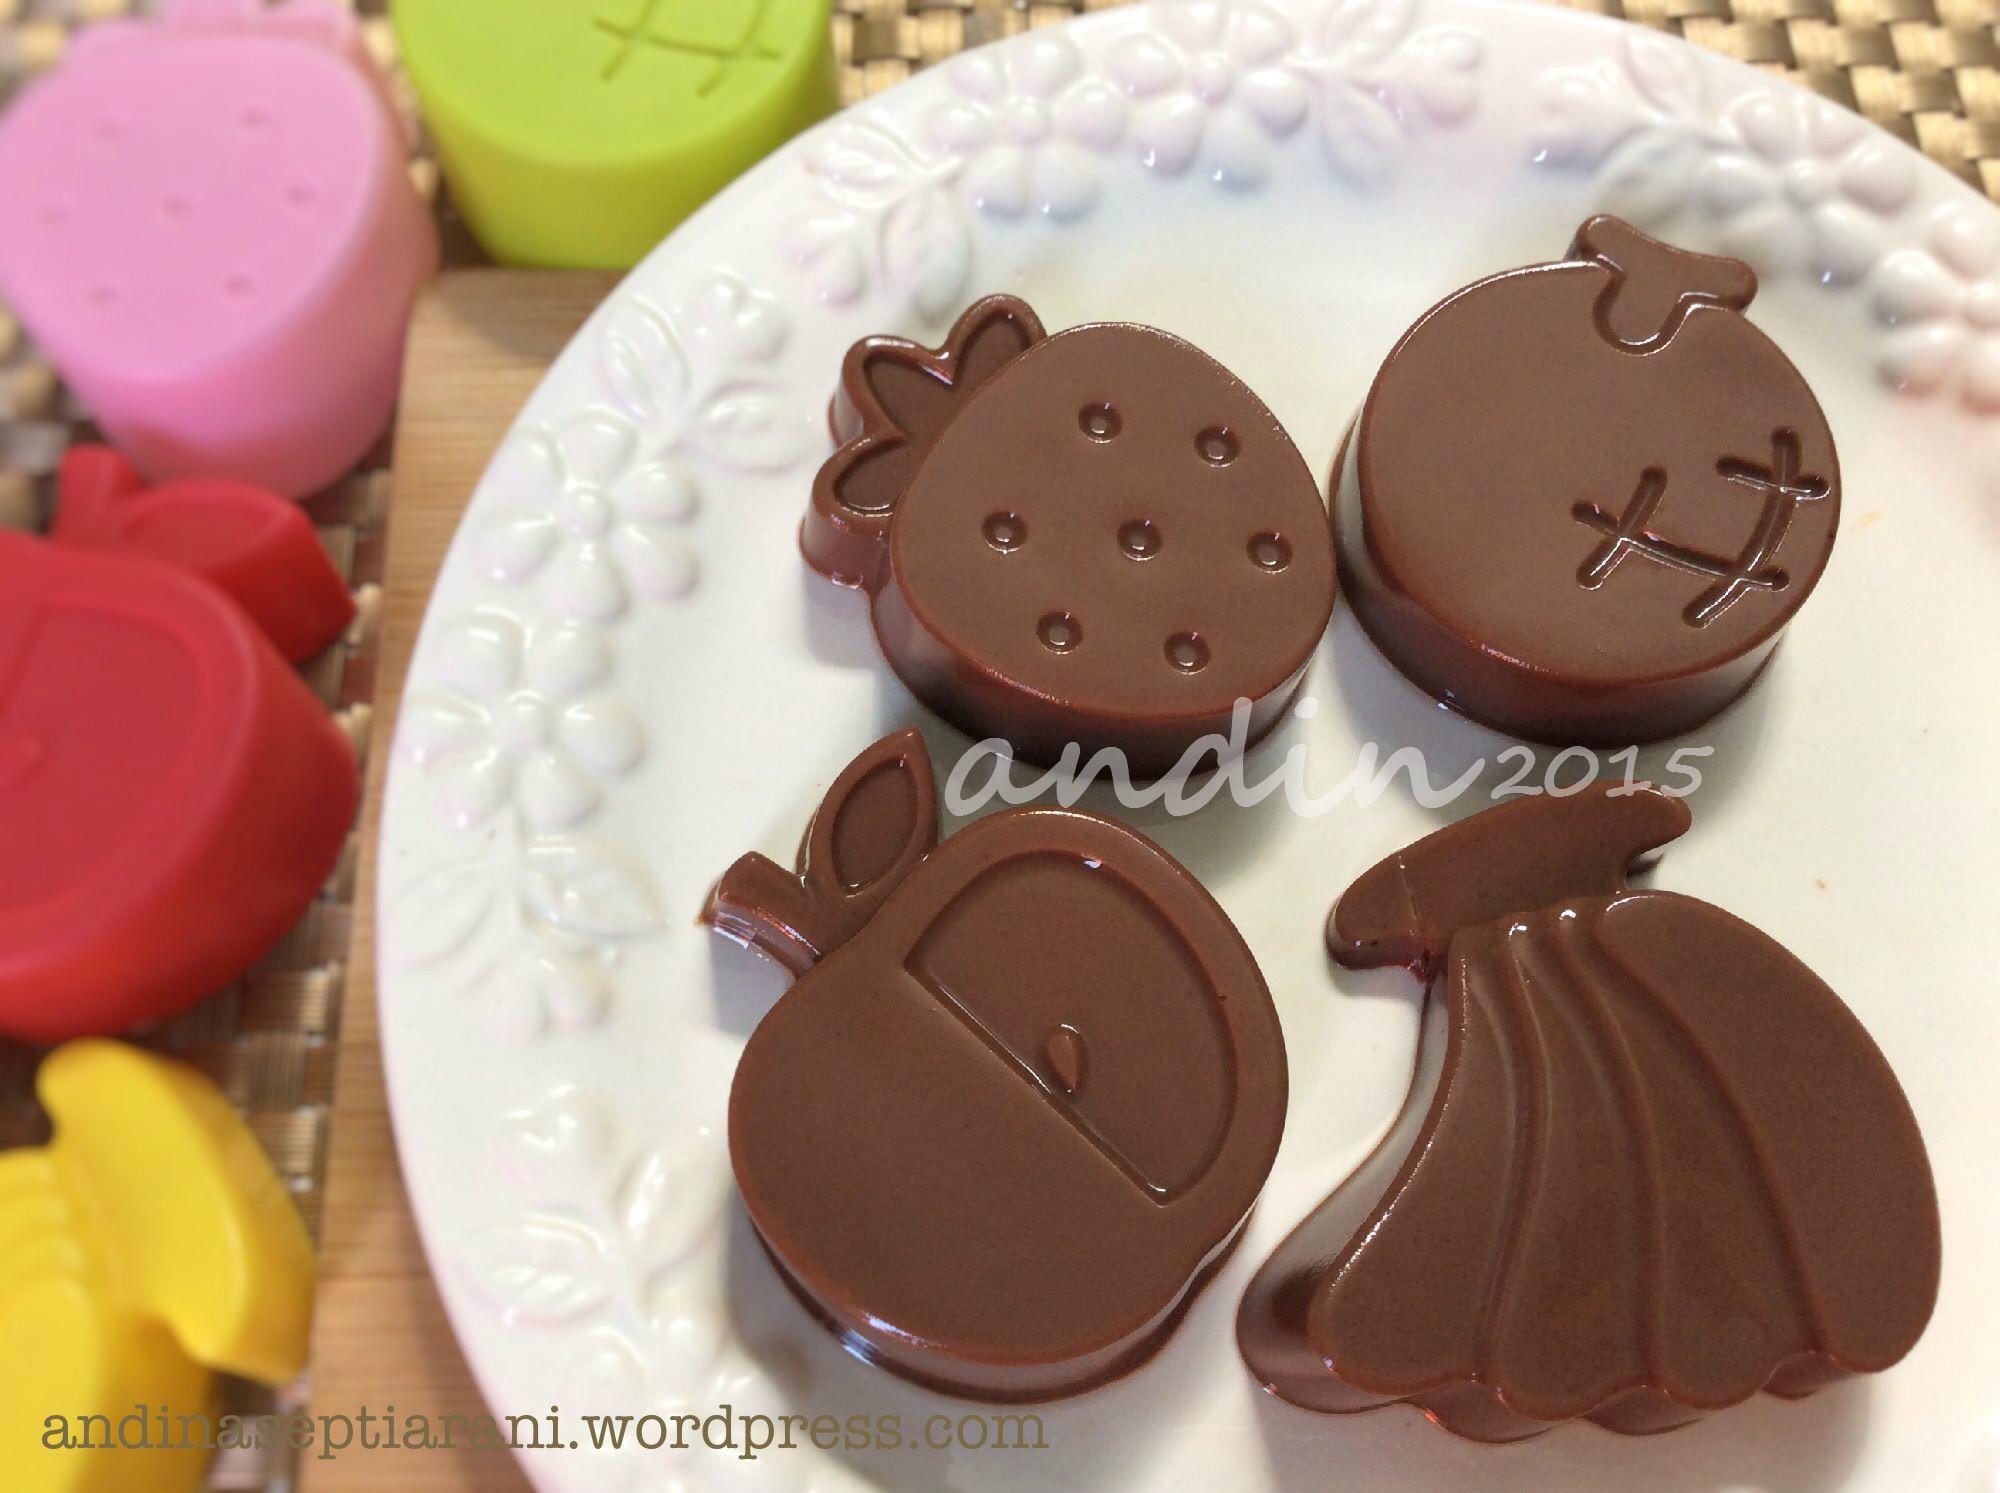 Resep] Puding Coklat Saus Vla Susu | andinaseptiarani